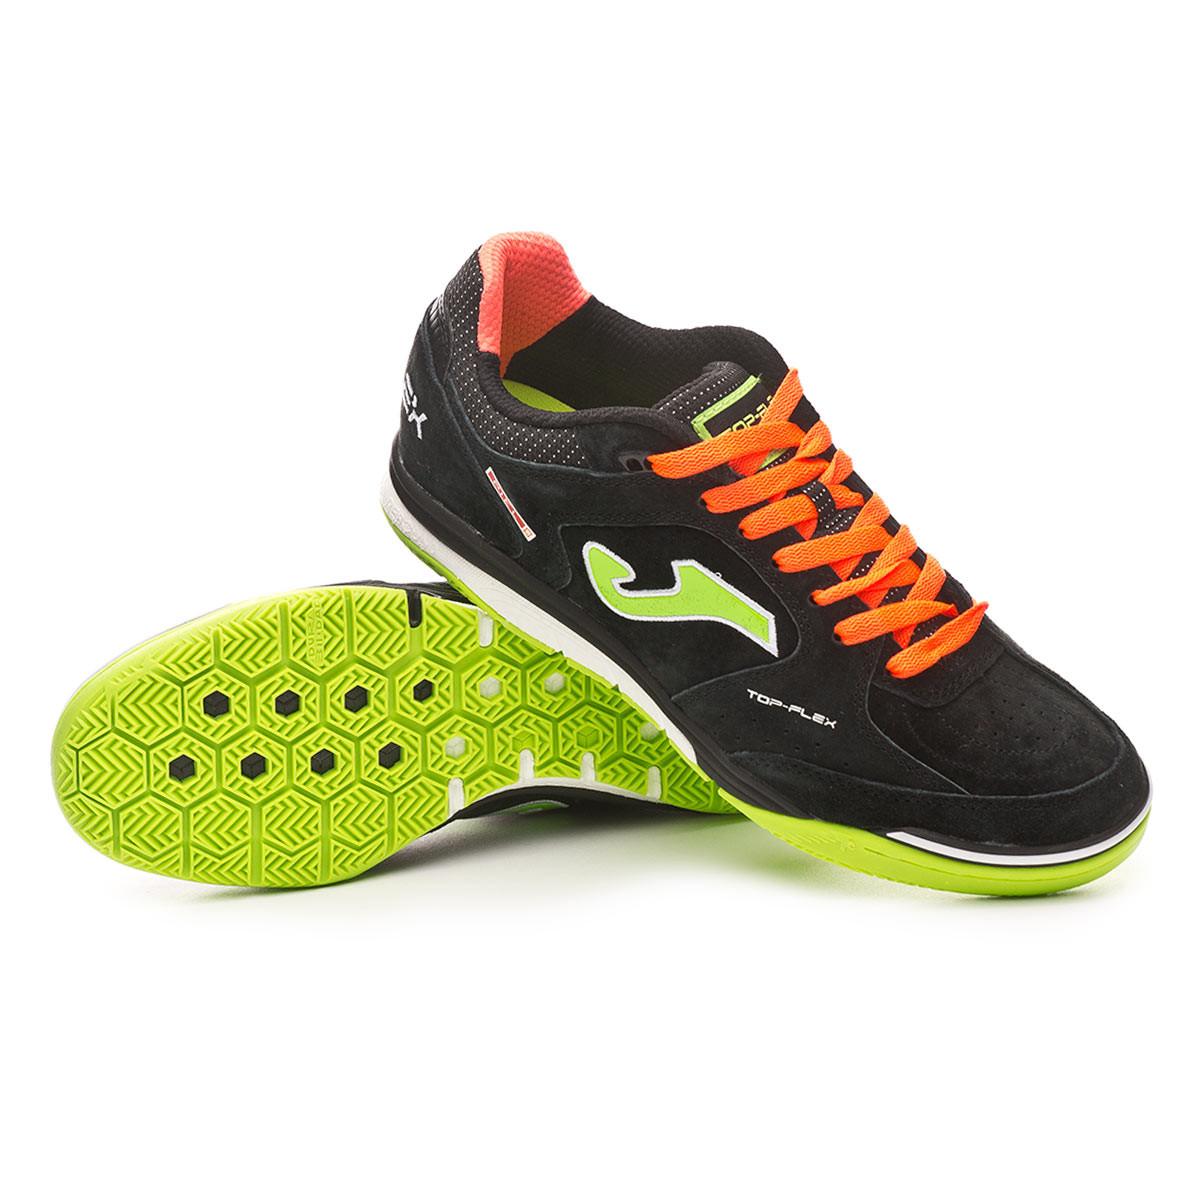 a0ce46cfda Futsal Boot Joma Top Flex Nobuck Black-Orange - Football store Fútbol  Emotion